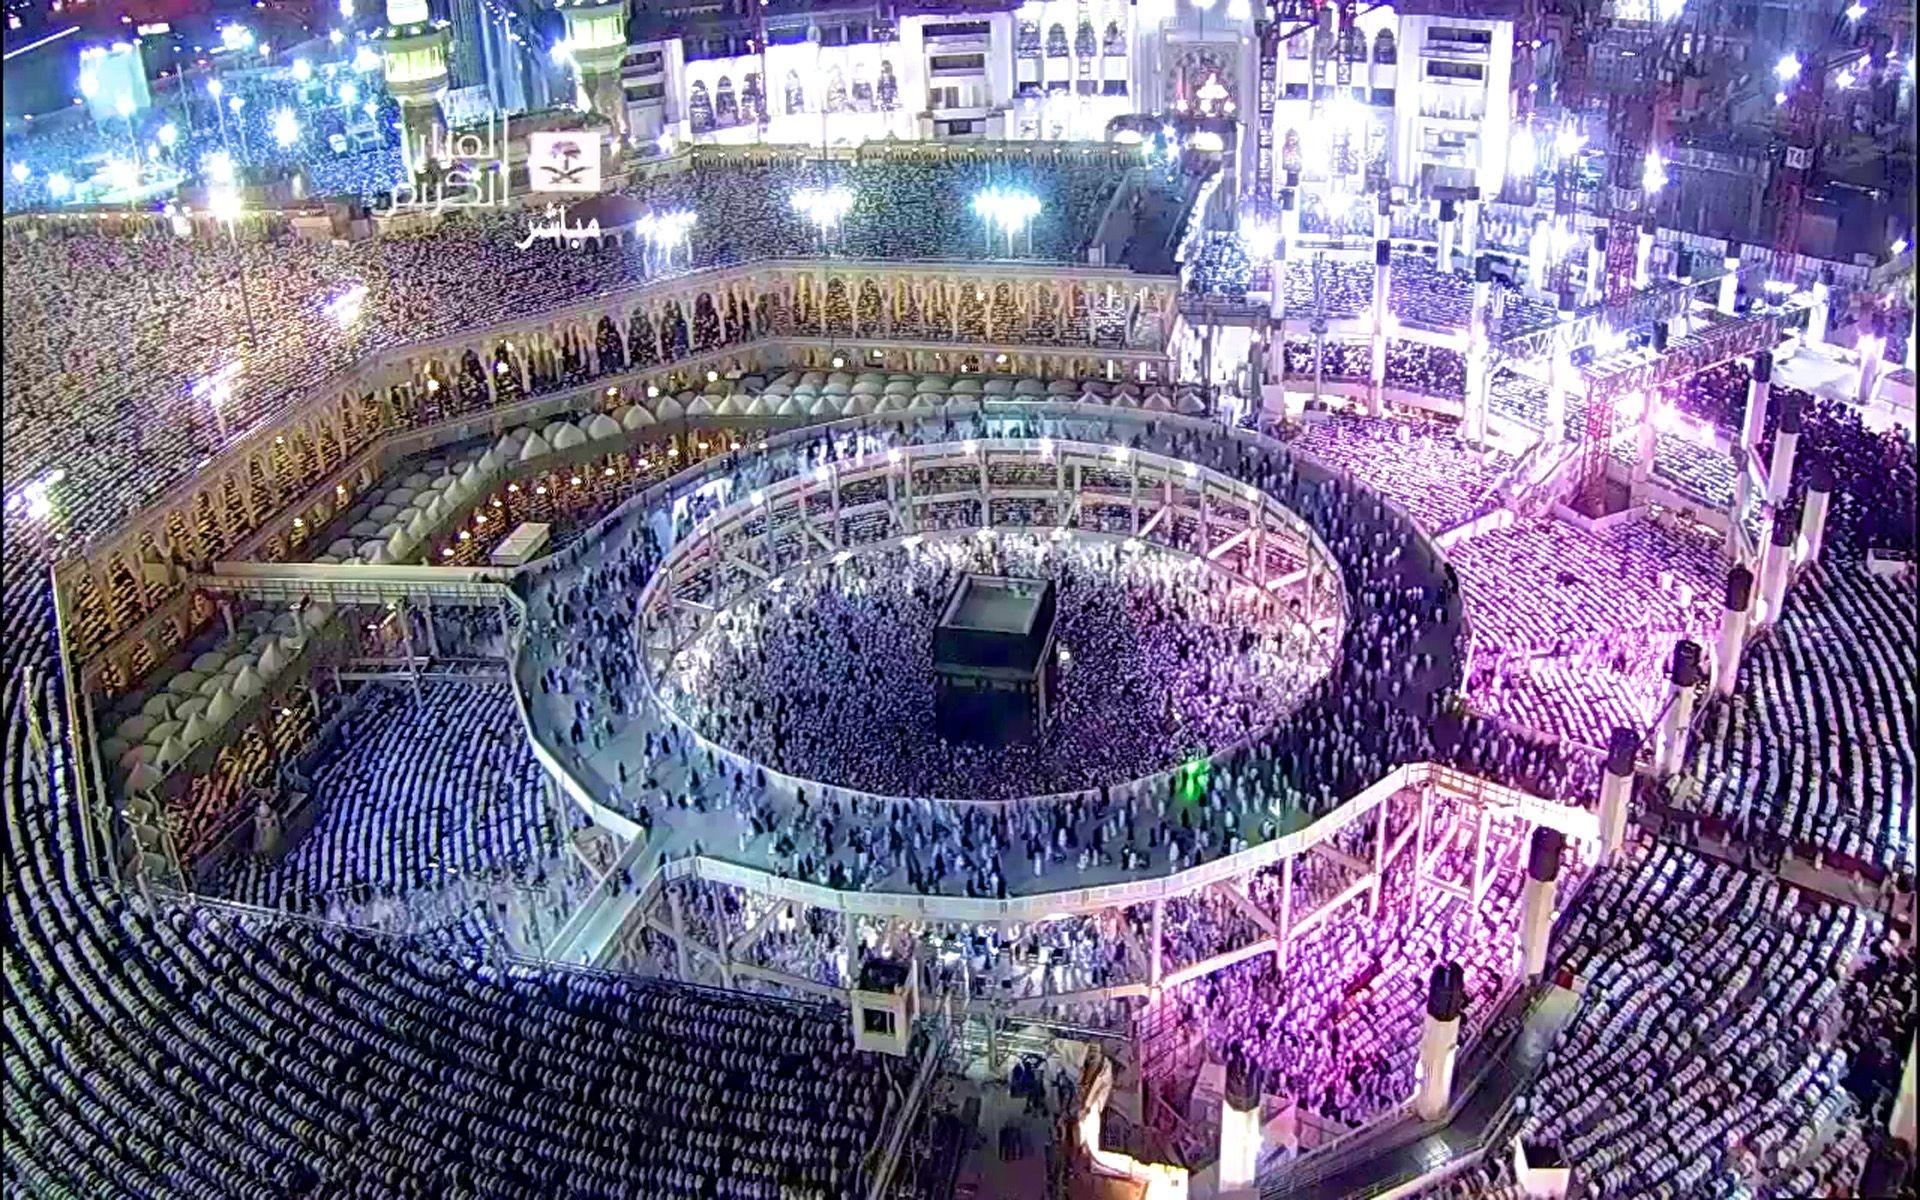 Res: 1920x1200, ... Known As Al Kaaba Al Musharrafah Building In The Center Of Islams  Holiest Mosque Is Al Masjid Al Haram In Mecca Saudi Arabia 1920×1200 free HD  Wallpaper ...